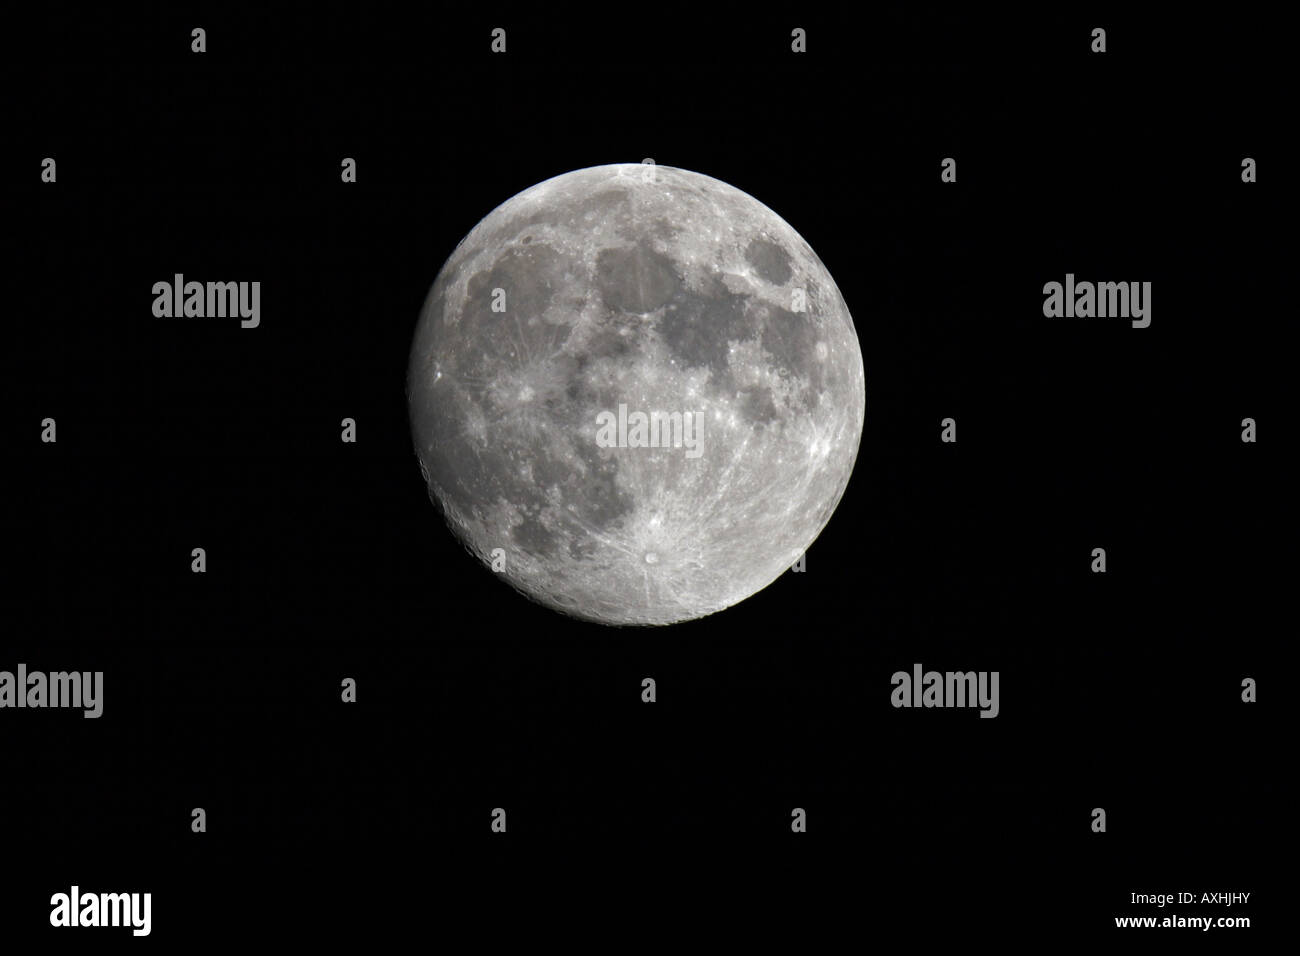 mond moon - Stock Image